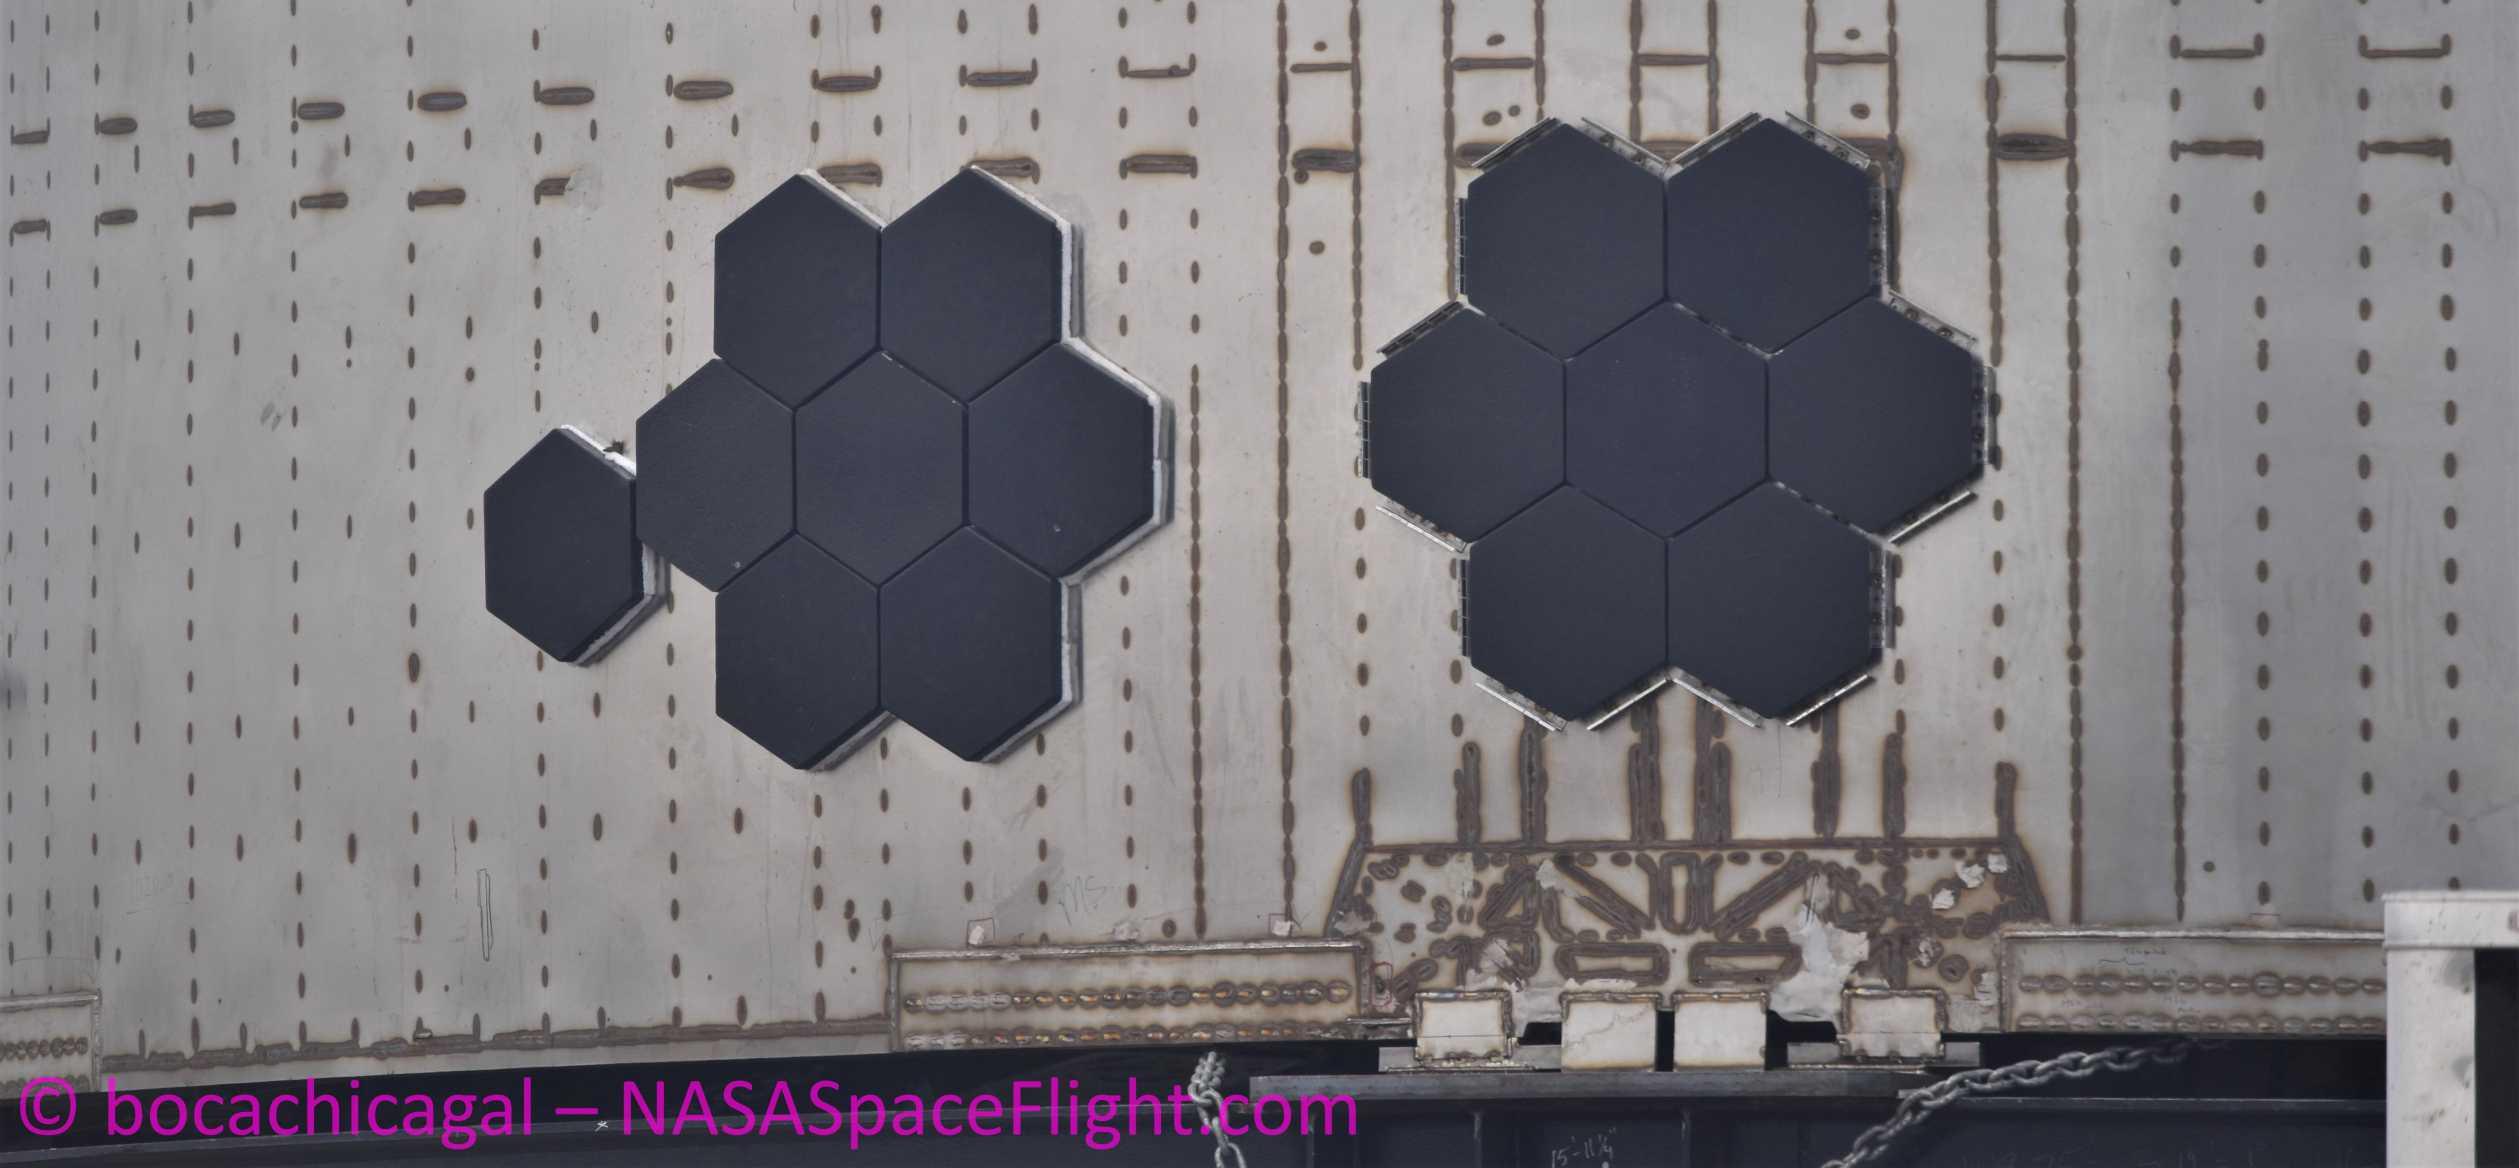 Starship Boca Chica 042320 (NASASpaceflight – bocachicagal) SN4 pad move TPS 2 crop (c)